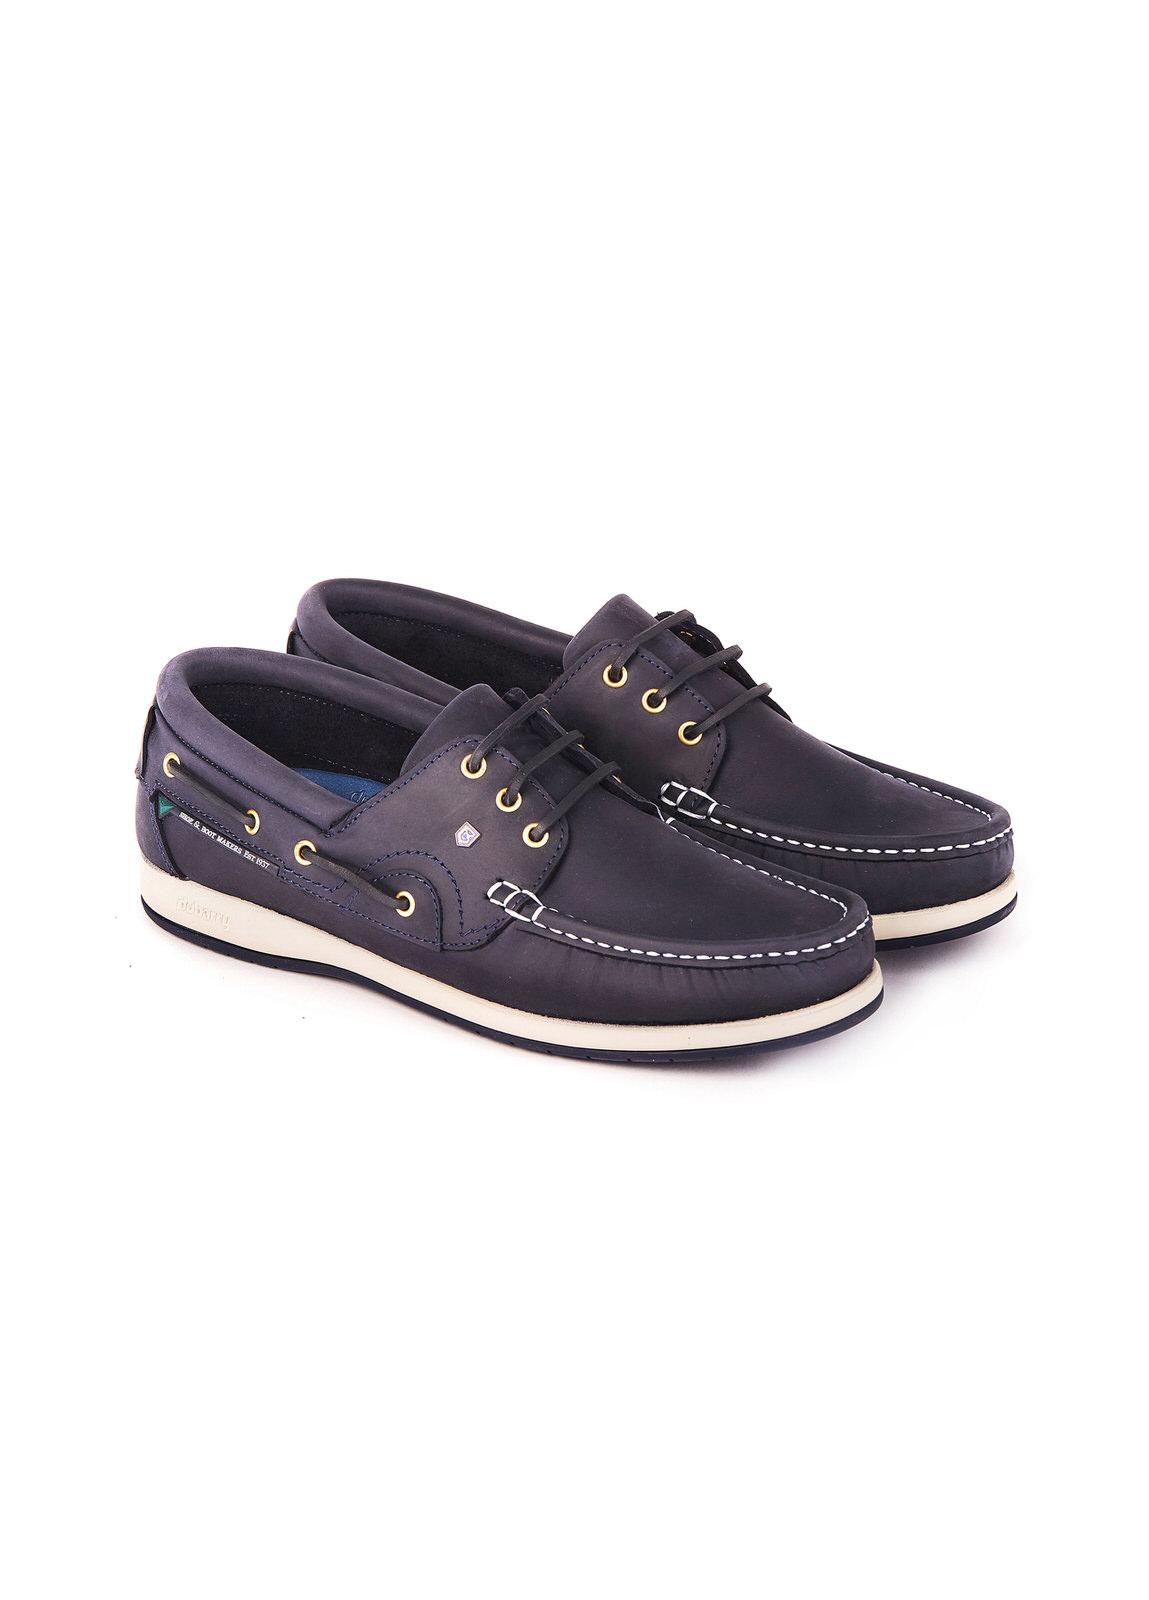 Commodore_XLT_Deck_Shoe_Navy_Image_1